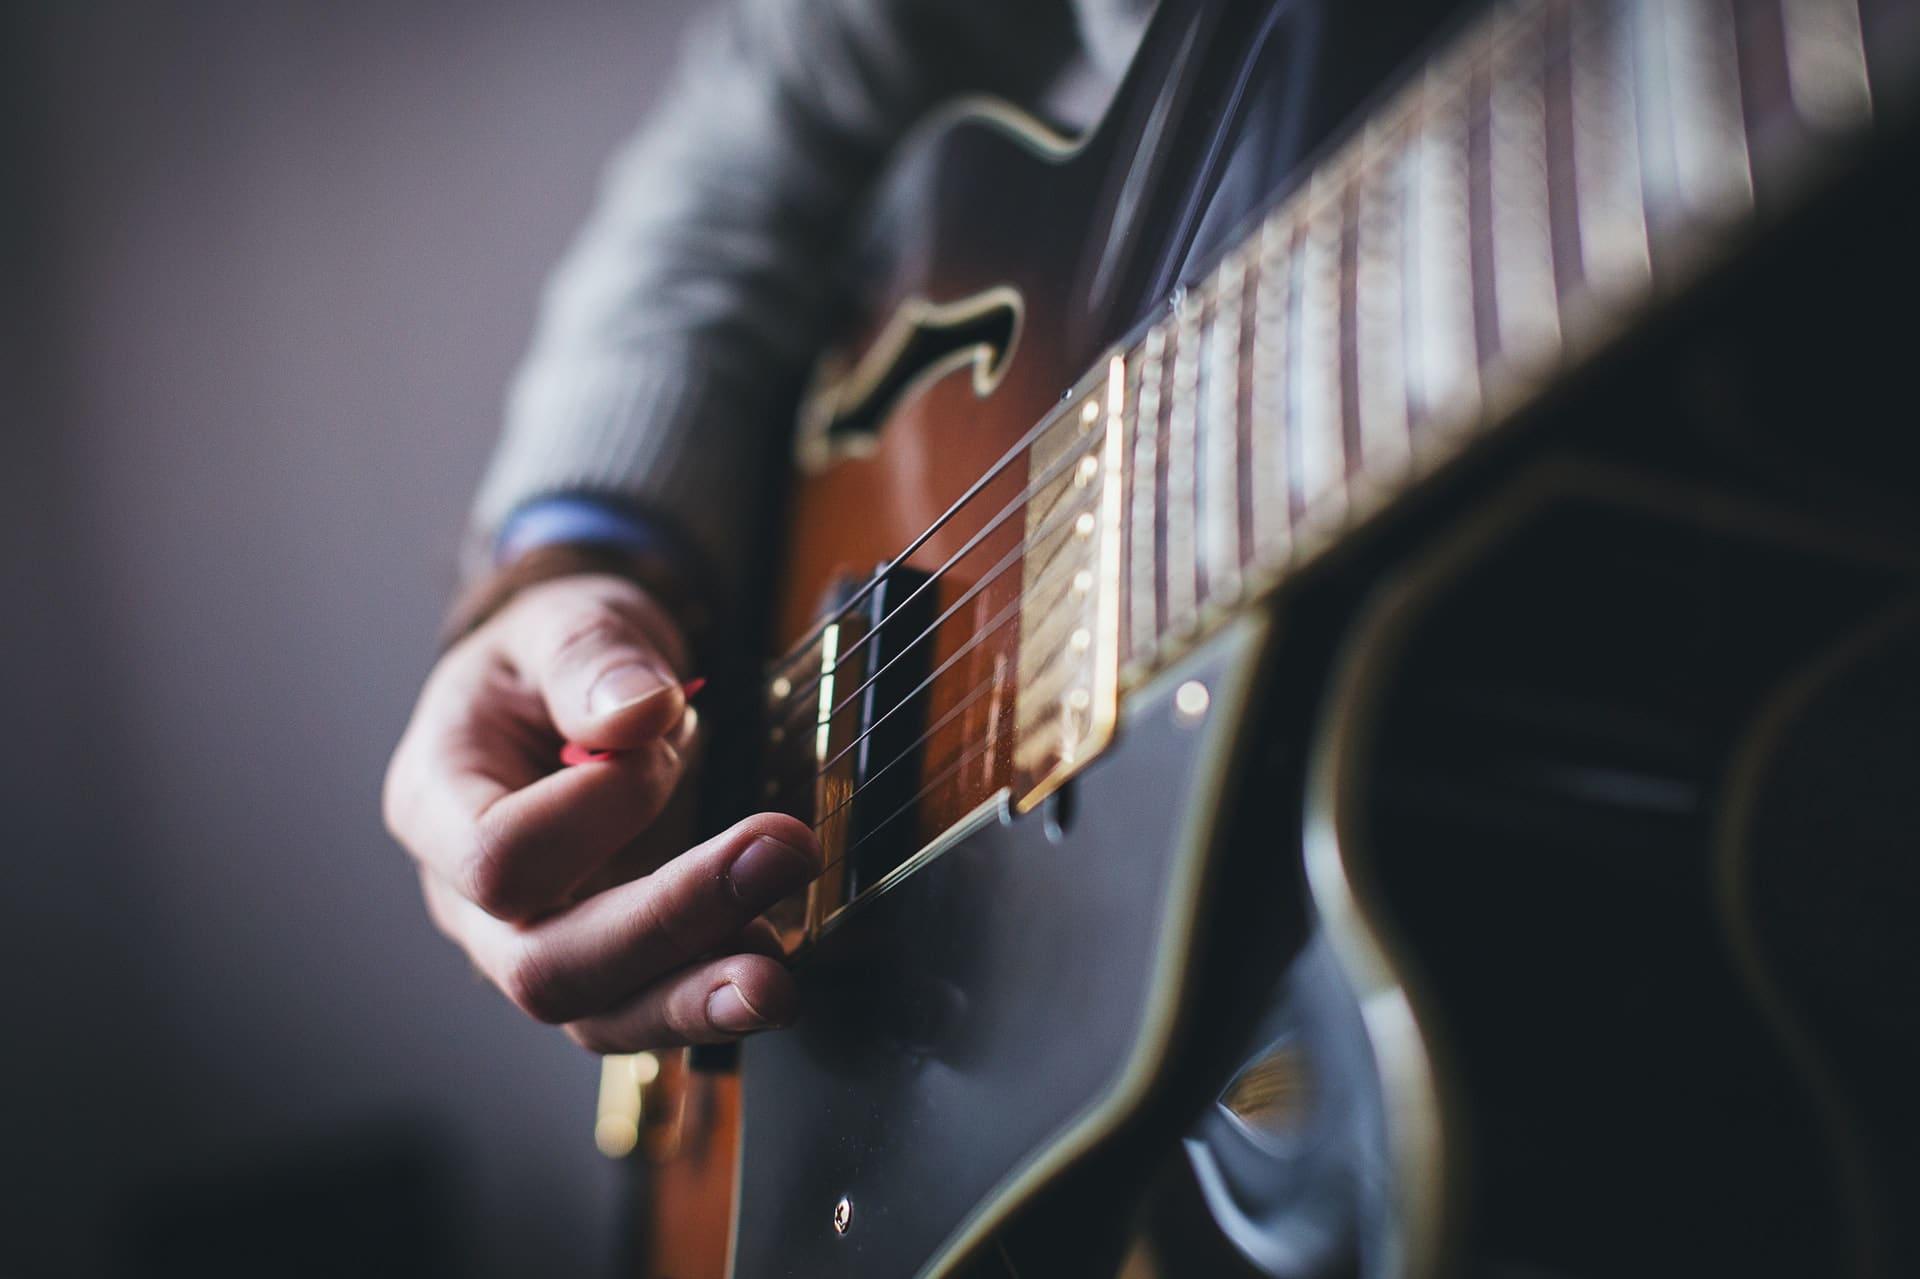 plektrum-rot-gitarrist-spielt